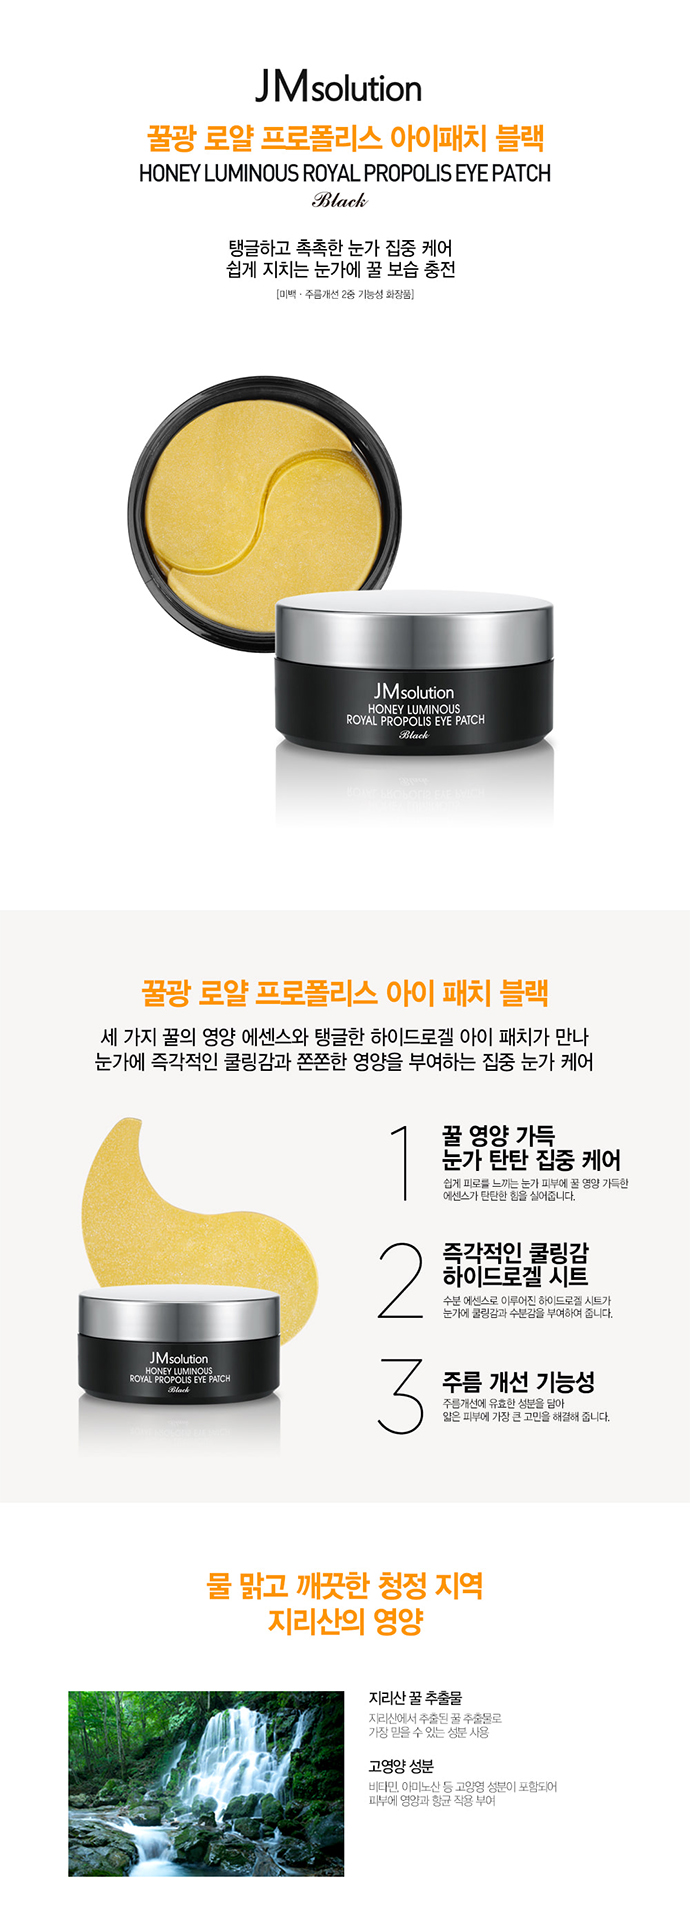 JMsolution] Honey Luminous Royal Propolis Eye Patch - 1pack (60pcs)  8809505542624 | eBay